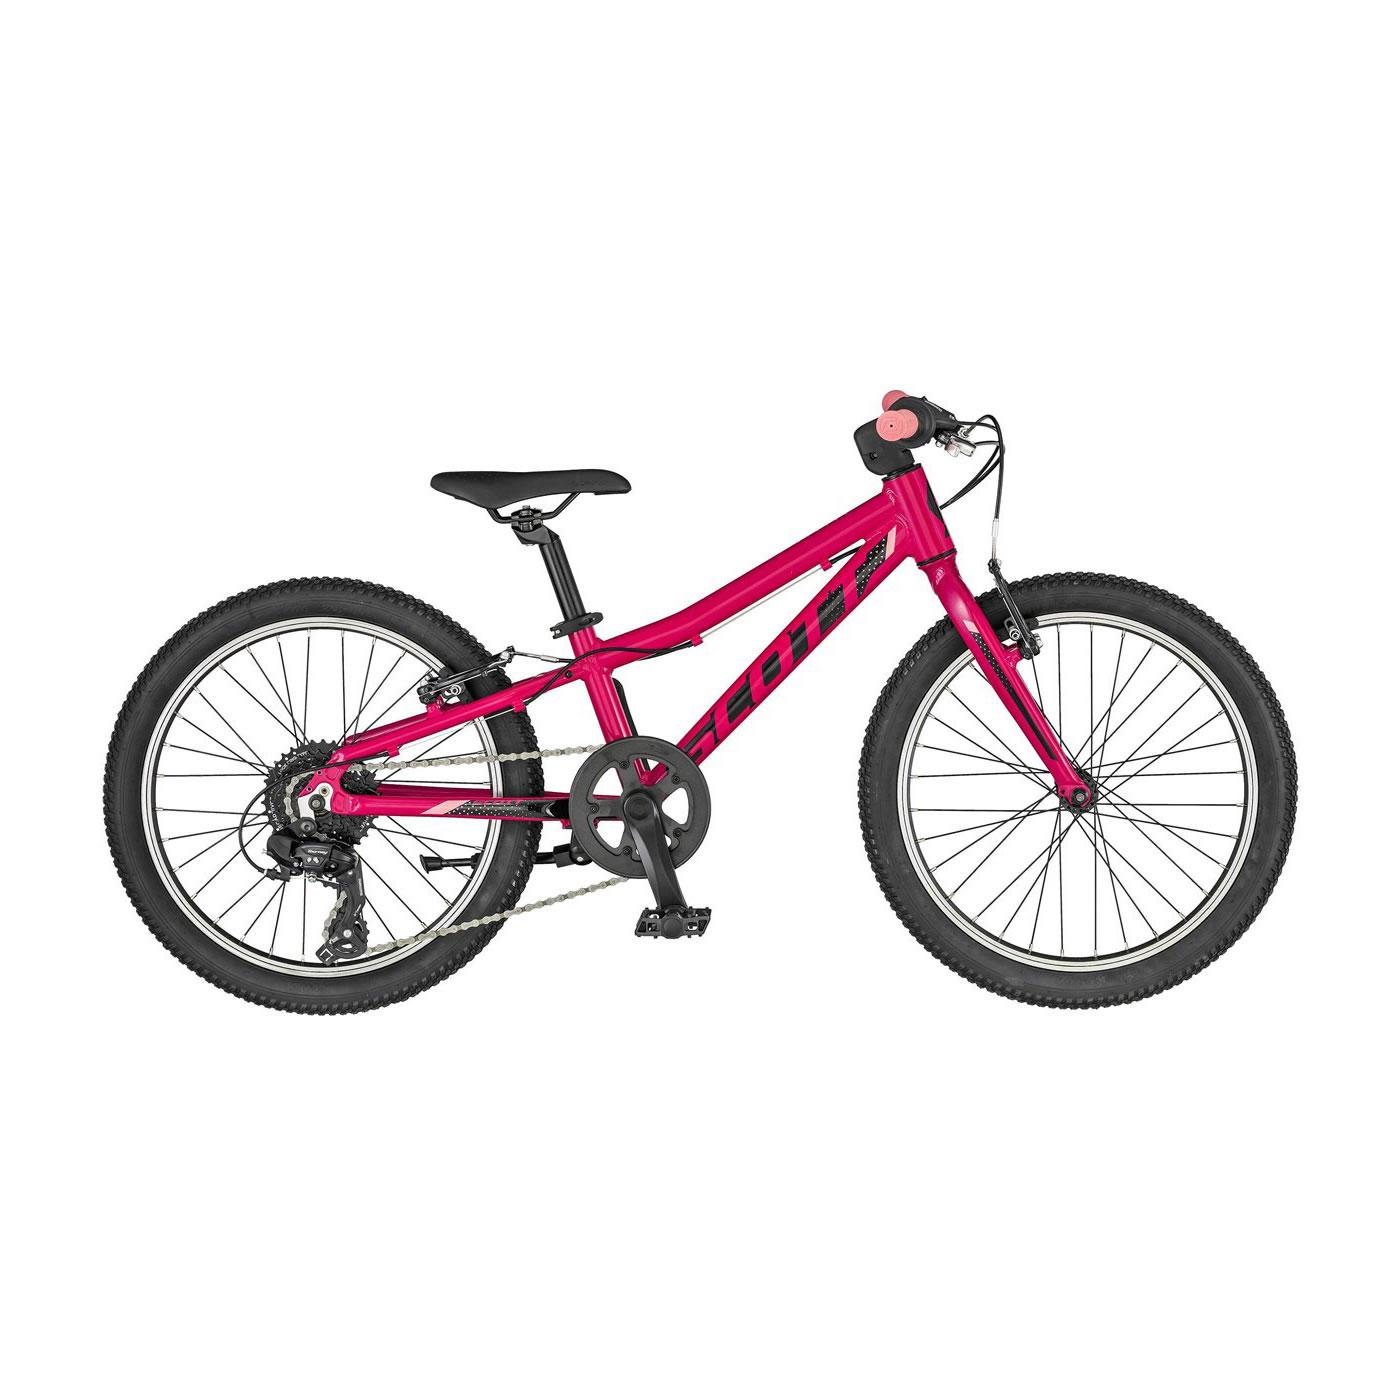 ad025e48aeb Scott Contessa JR Rigid 20w 2019 – Kids Bike | Bikestyle